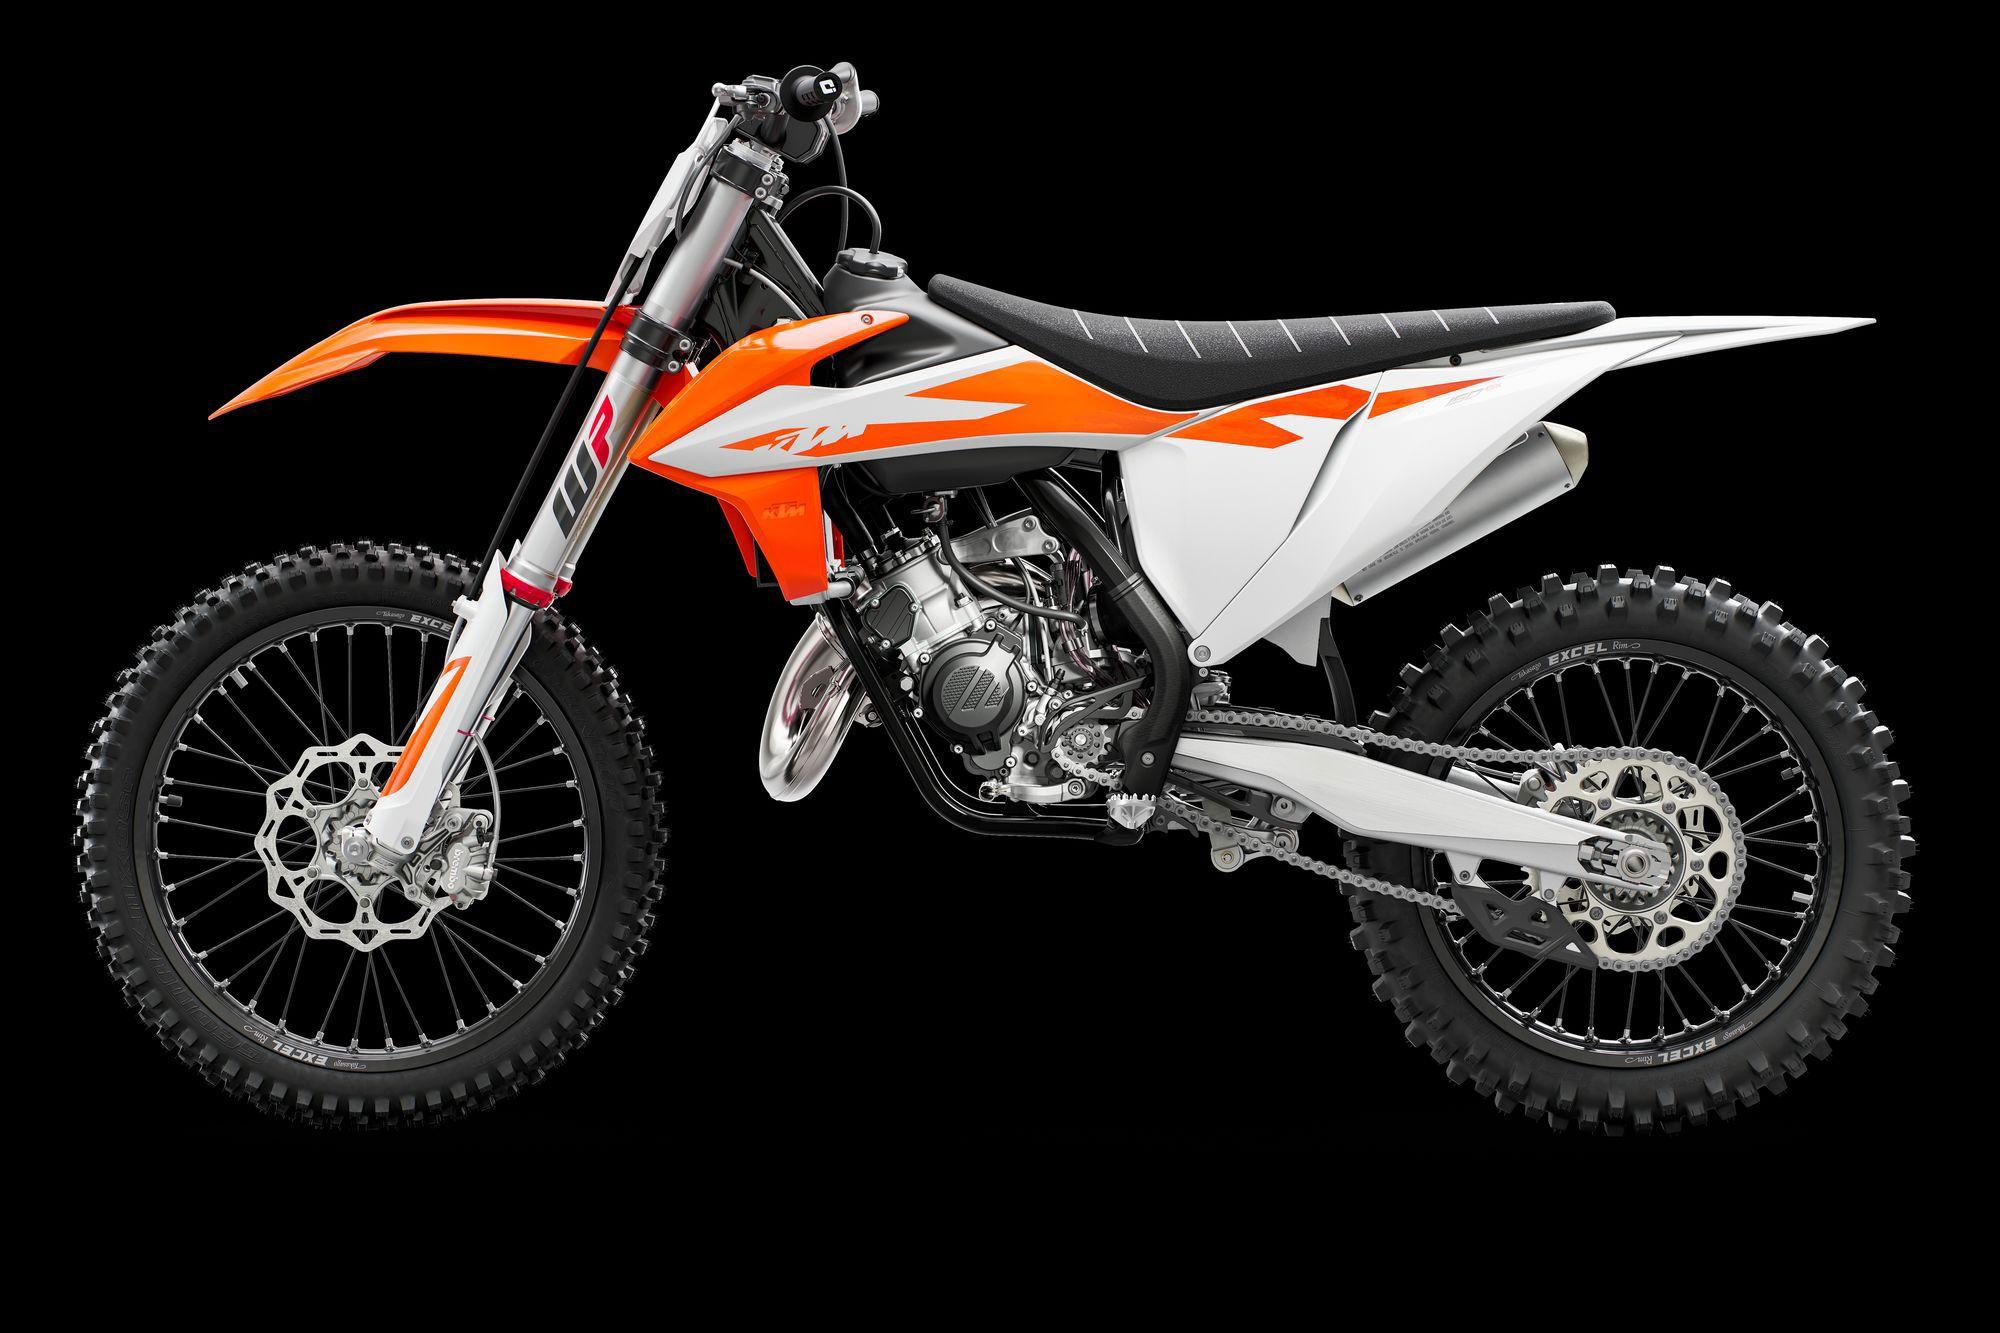 2020 Ktm 150 Sx Guide Ktm Motorcycle Motorcycle Model